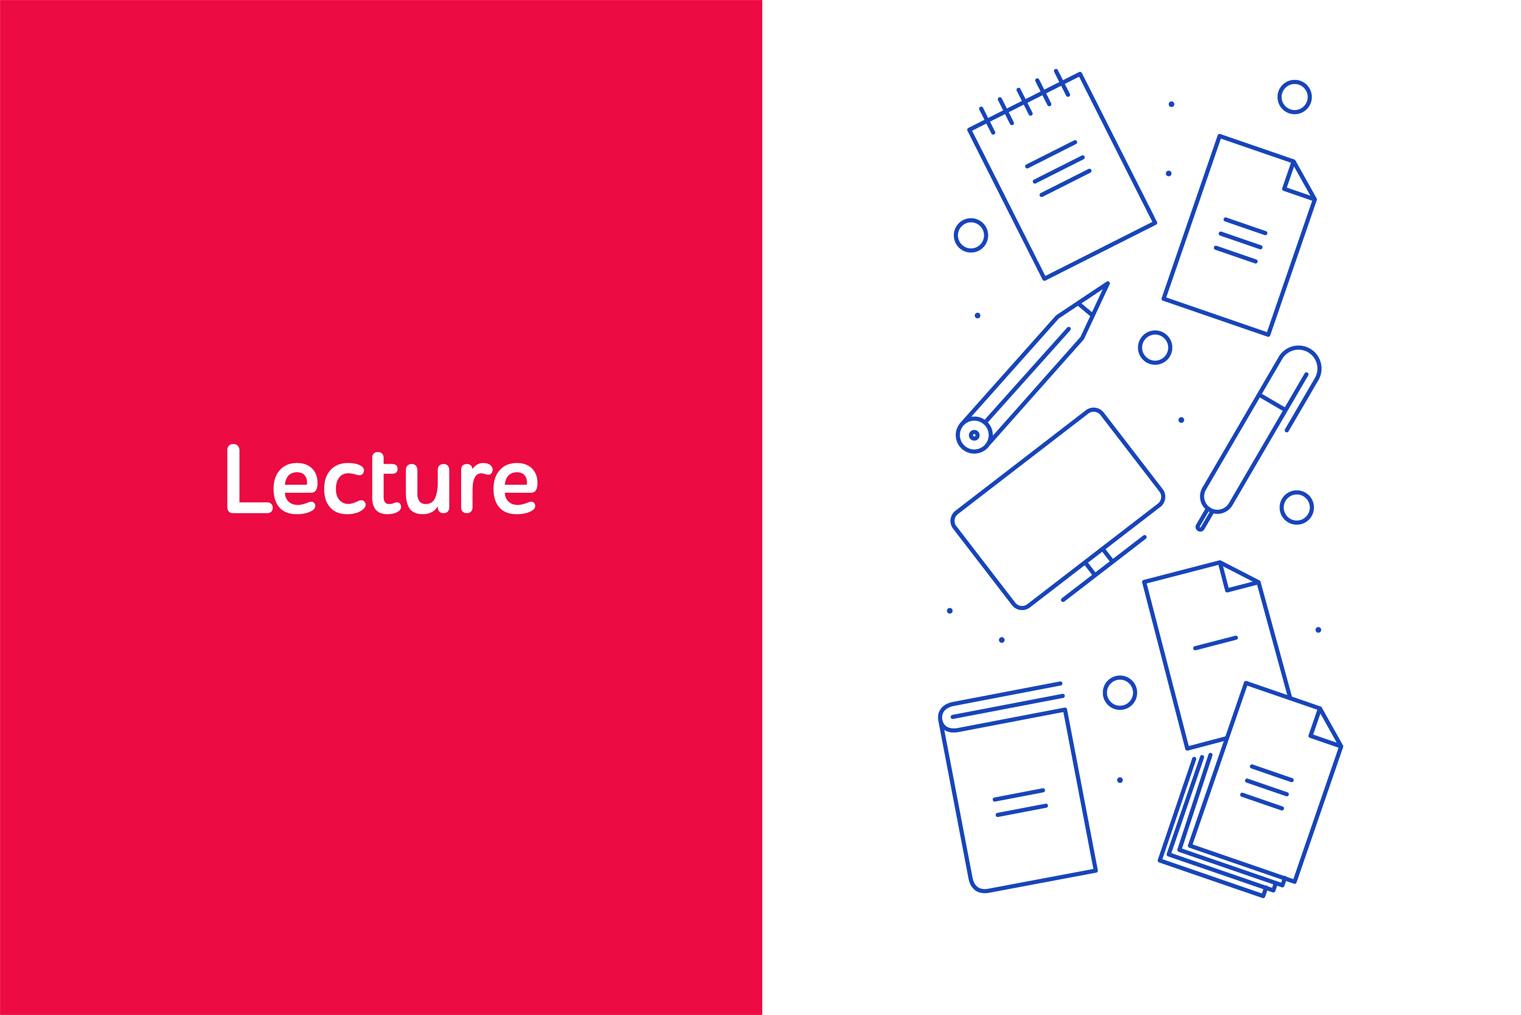 NYU Professor Stanislav Sobolevsky's lecture 'Digital City'